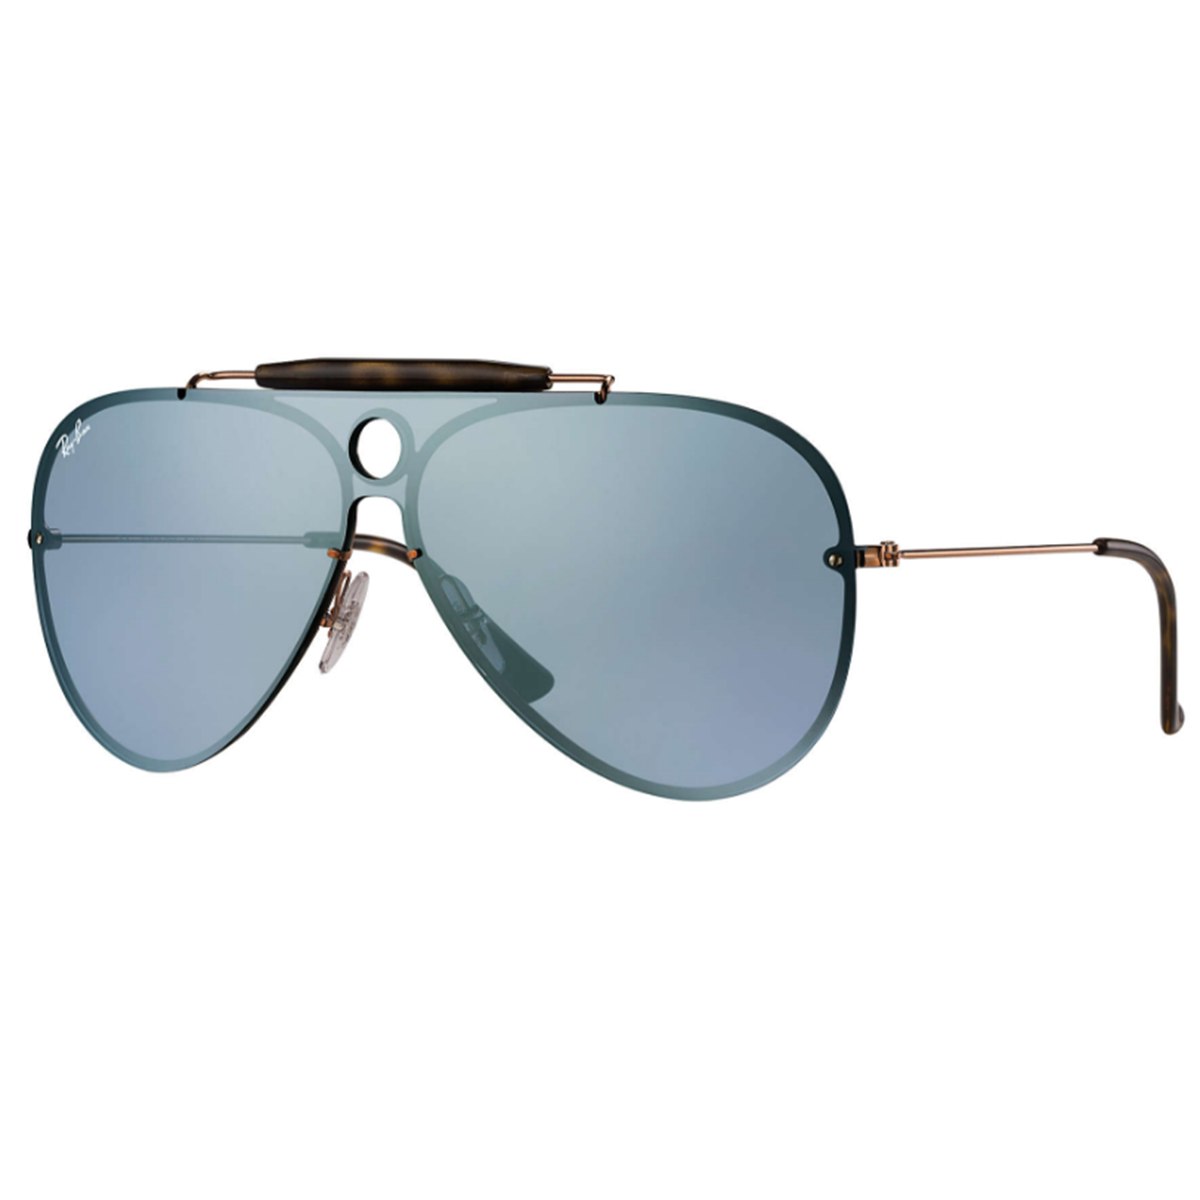 721a004e52676 Compre Óculos de Sol Ray Ban Blaze Shooter em 10X